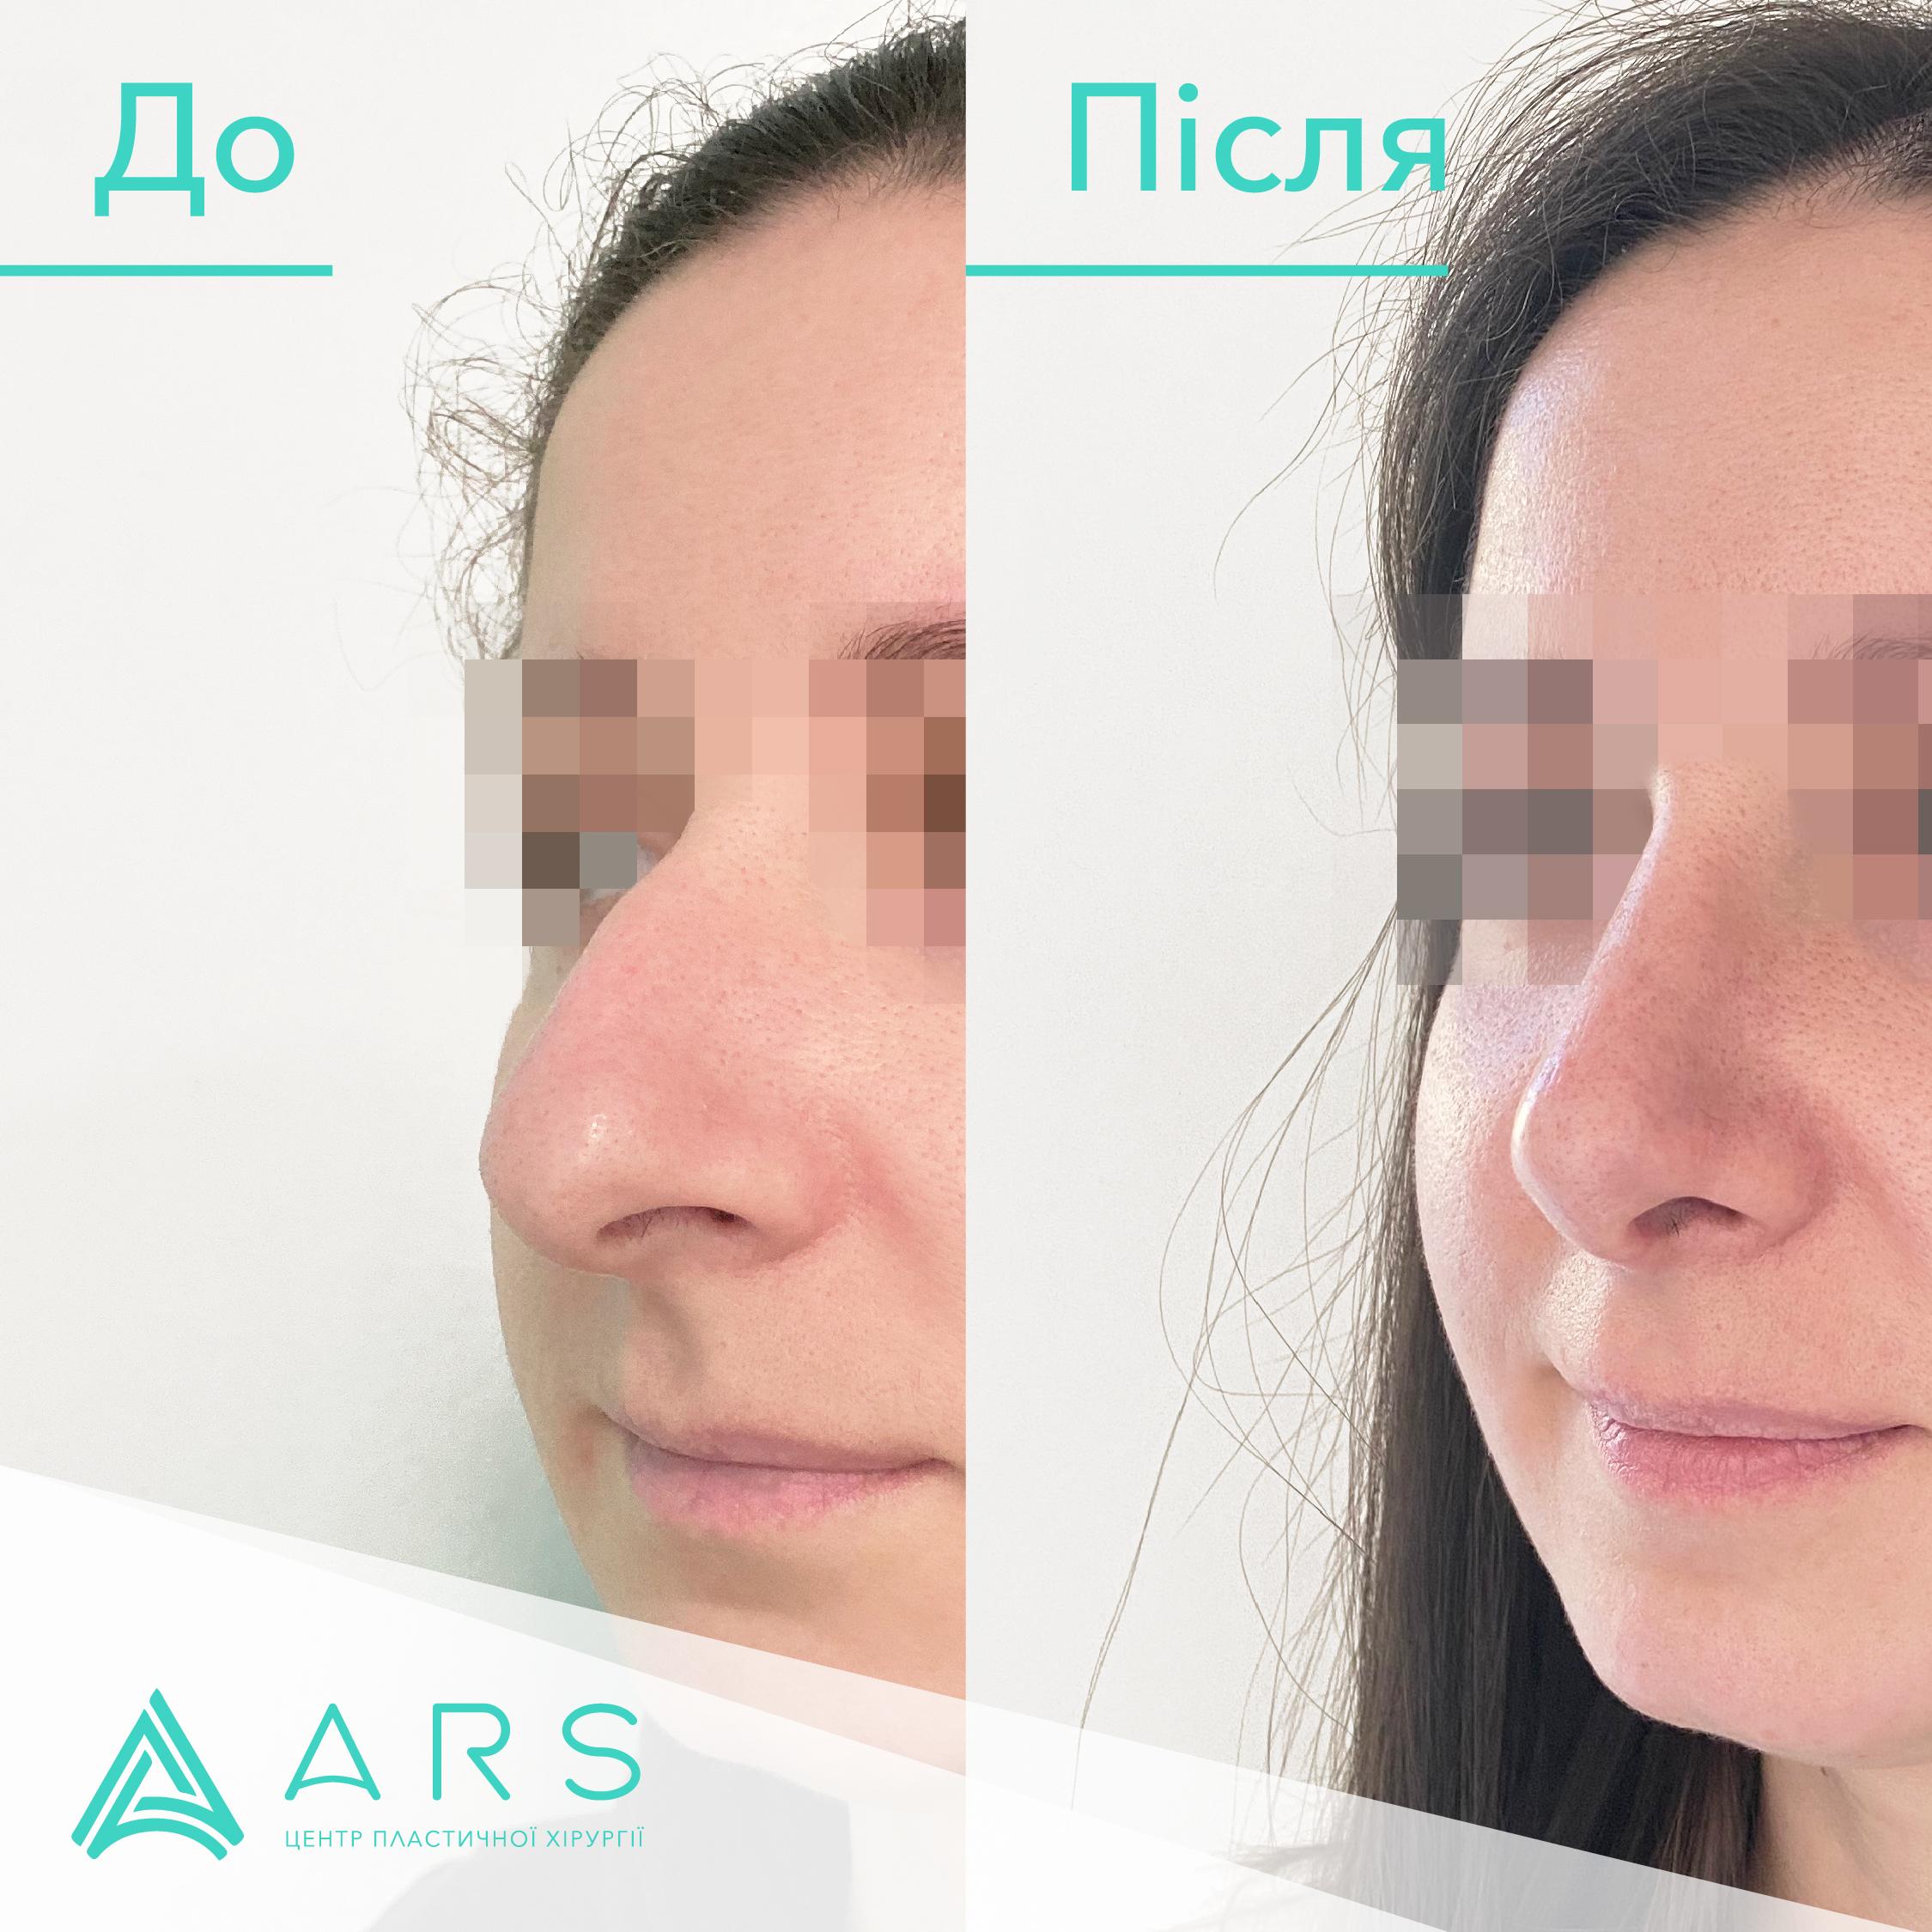 Пластика перегородки носа (септопластика) до/после #8